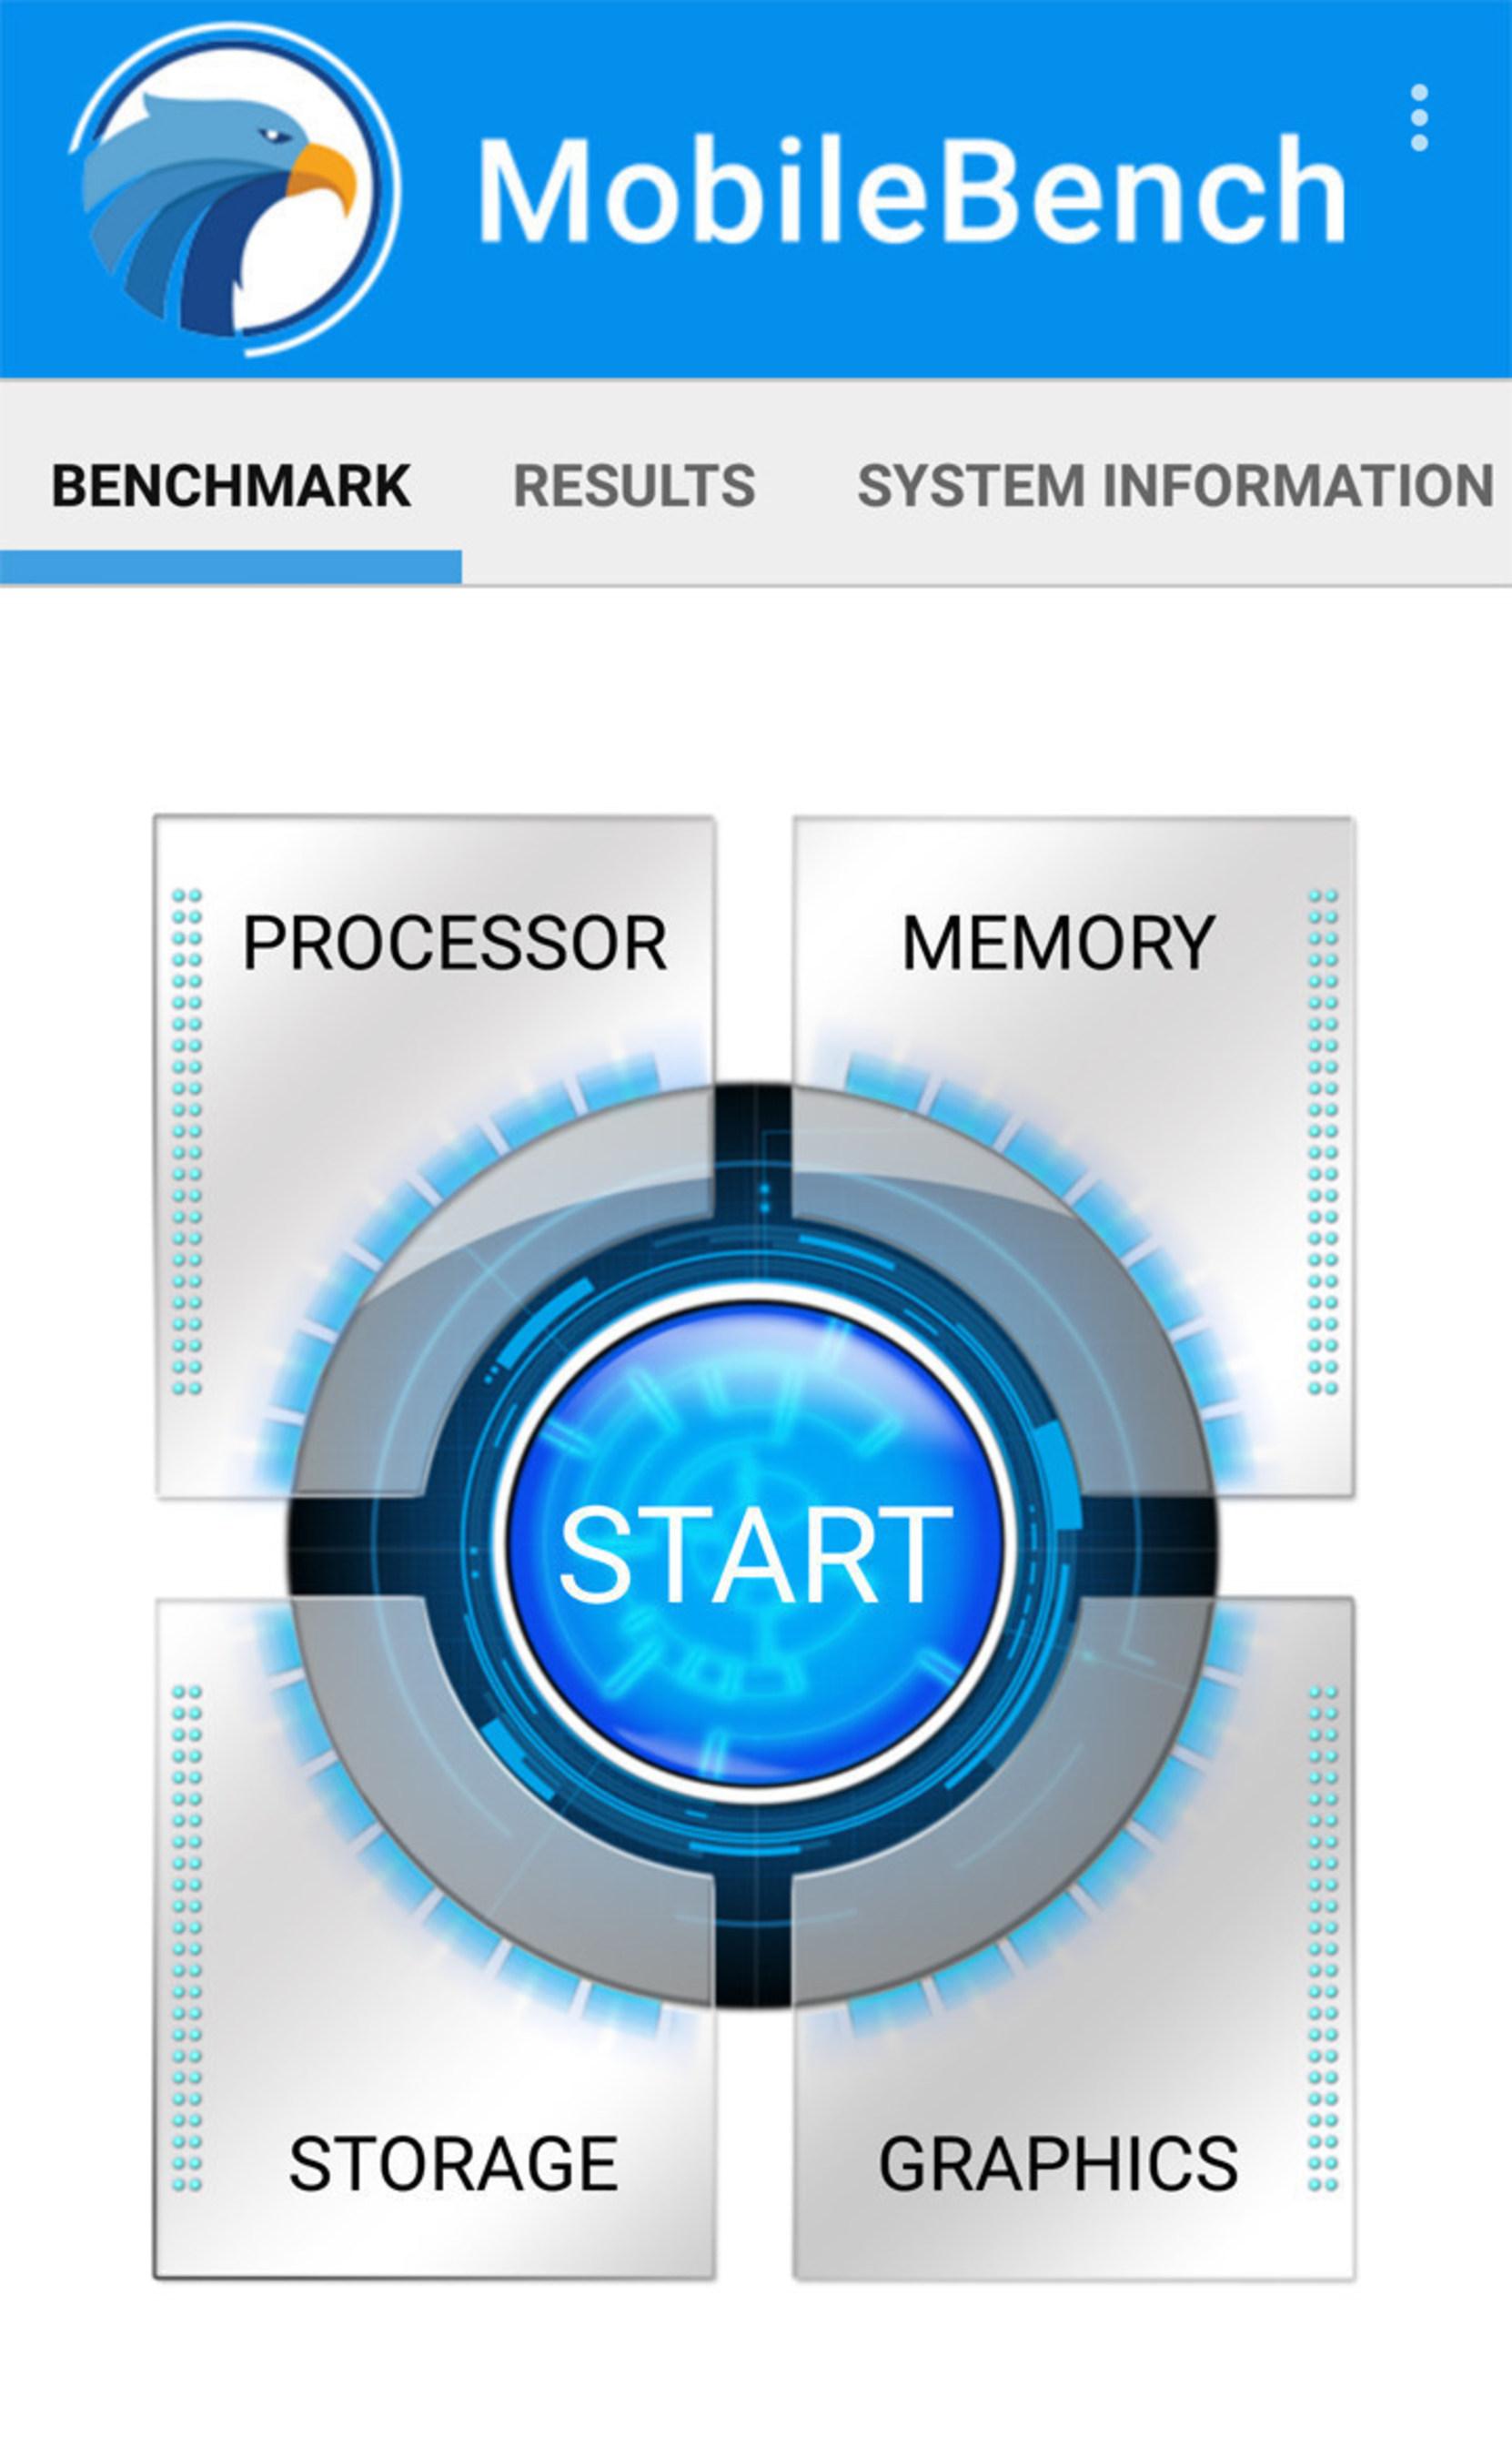 MobileBench Consortium Releases Signature Mobile Benchmark Version 2.0; Announces New Partnership with Arizona State University